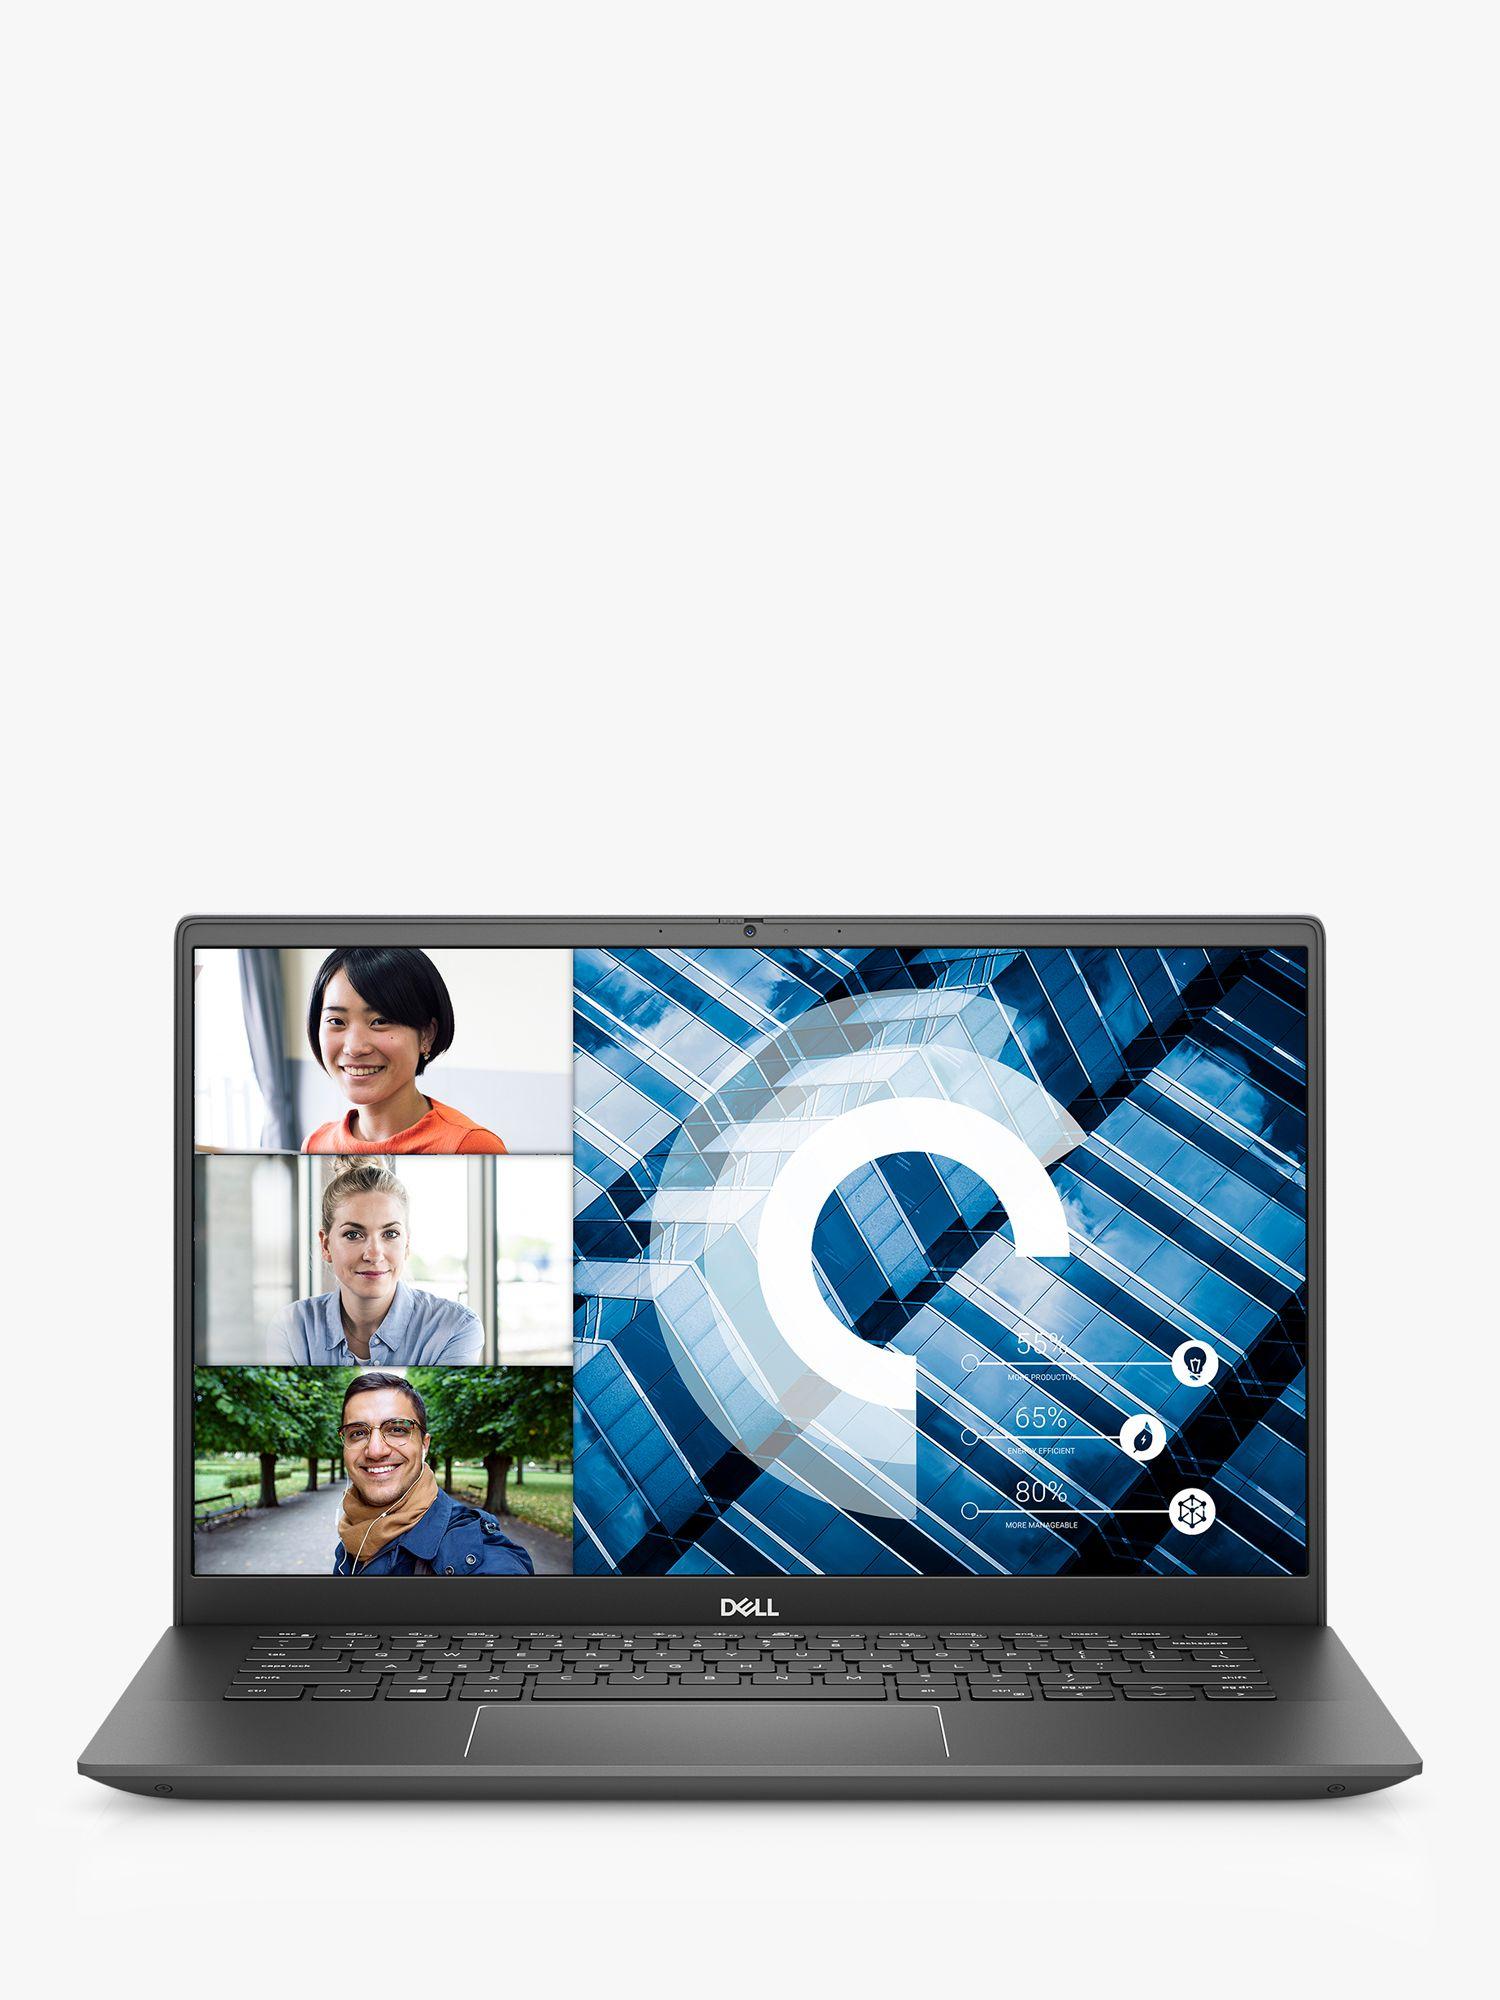 Dell Inspiron 14 5401 Laptop, Intel Core i5 Processor, 8GB RAM, 512GB SSD, 14 Full HD